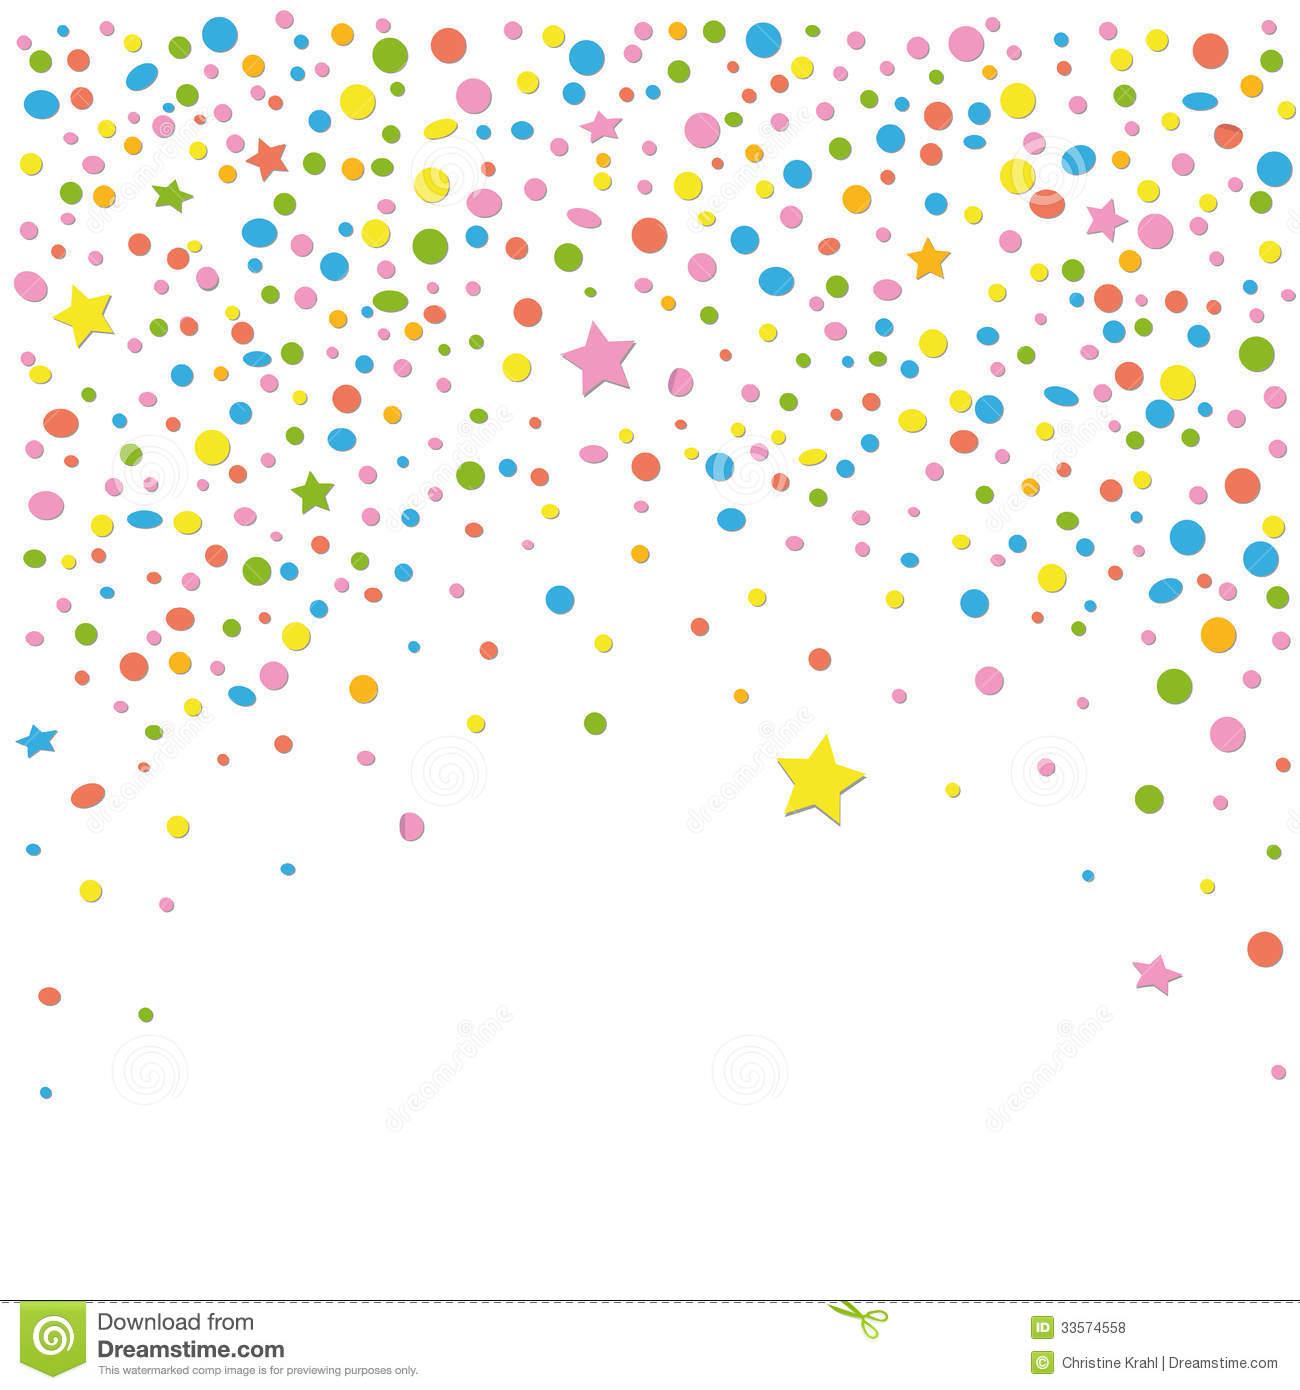 Confetti Vector Art at GetDrawings.com.